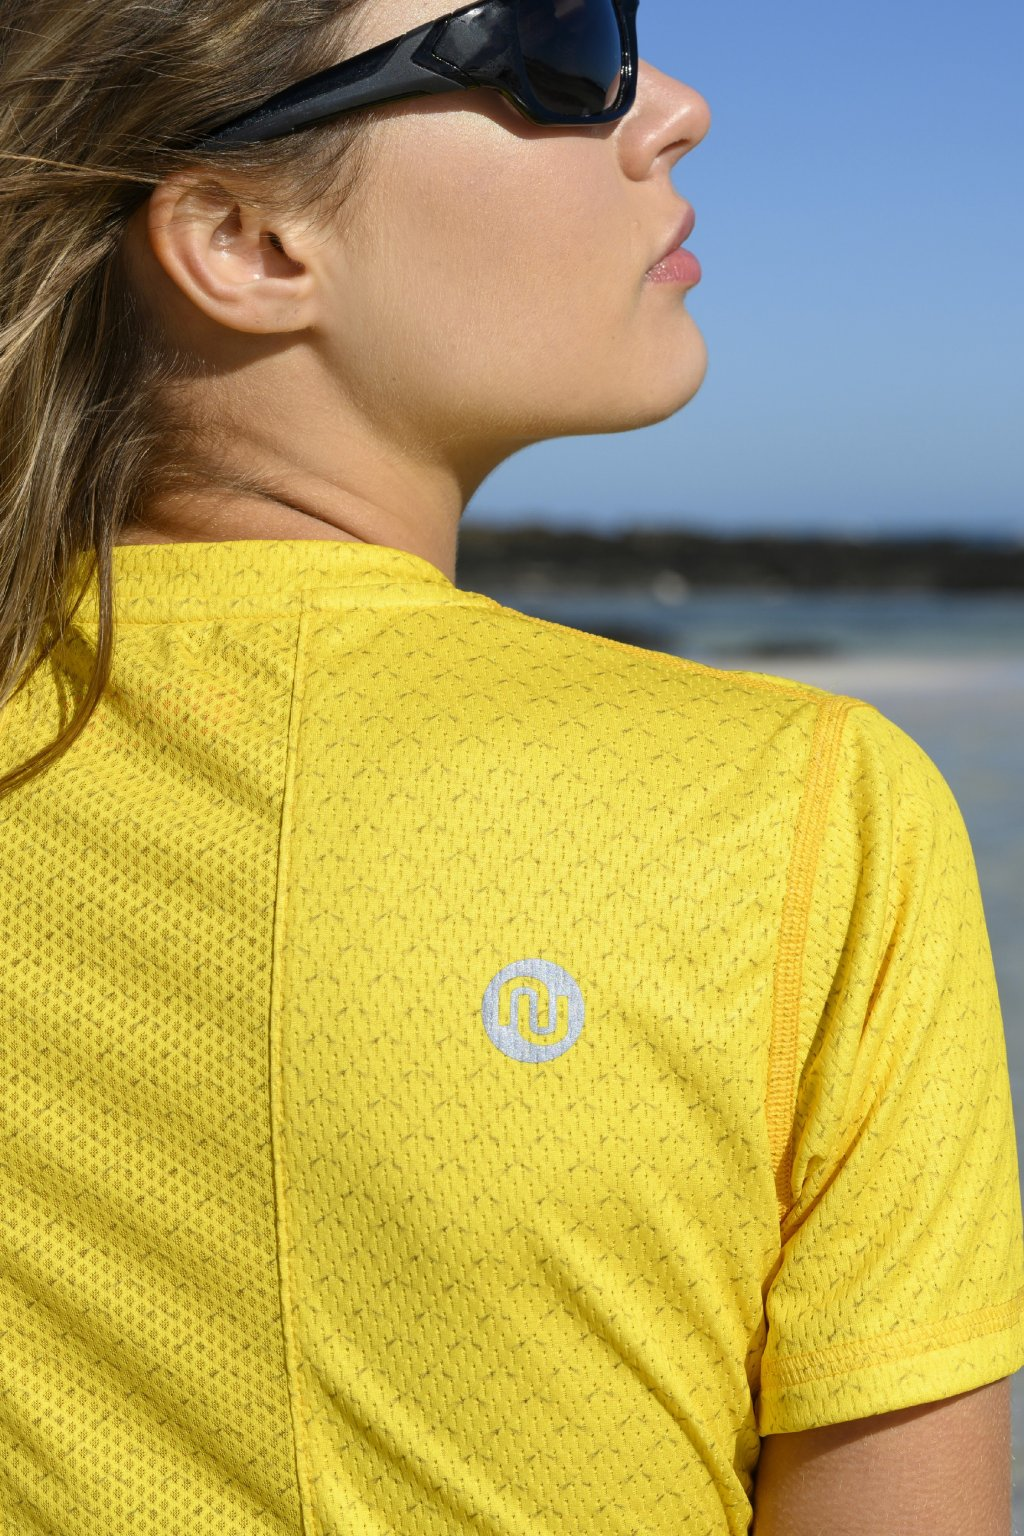 Běžecké tričko yellow mirage ksb 11x1 1